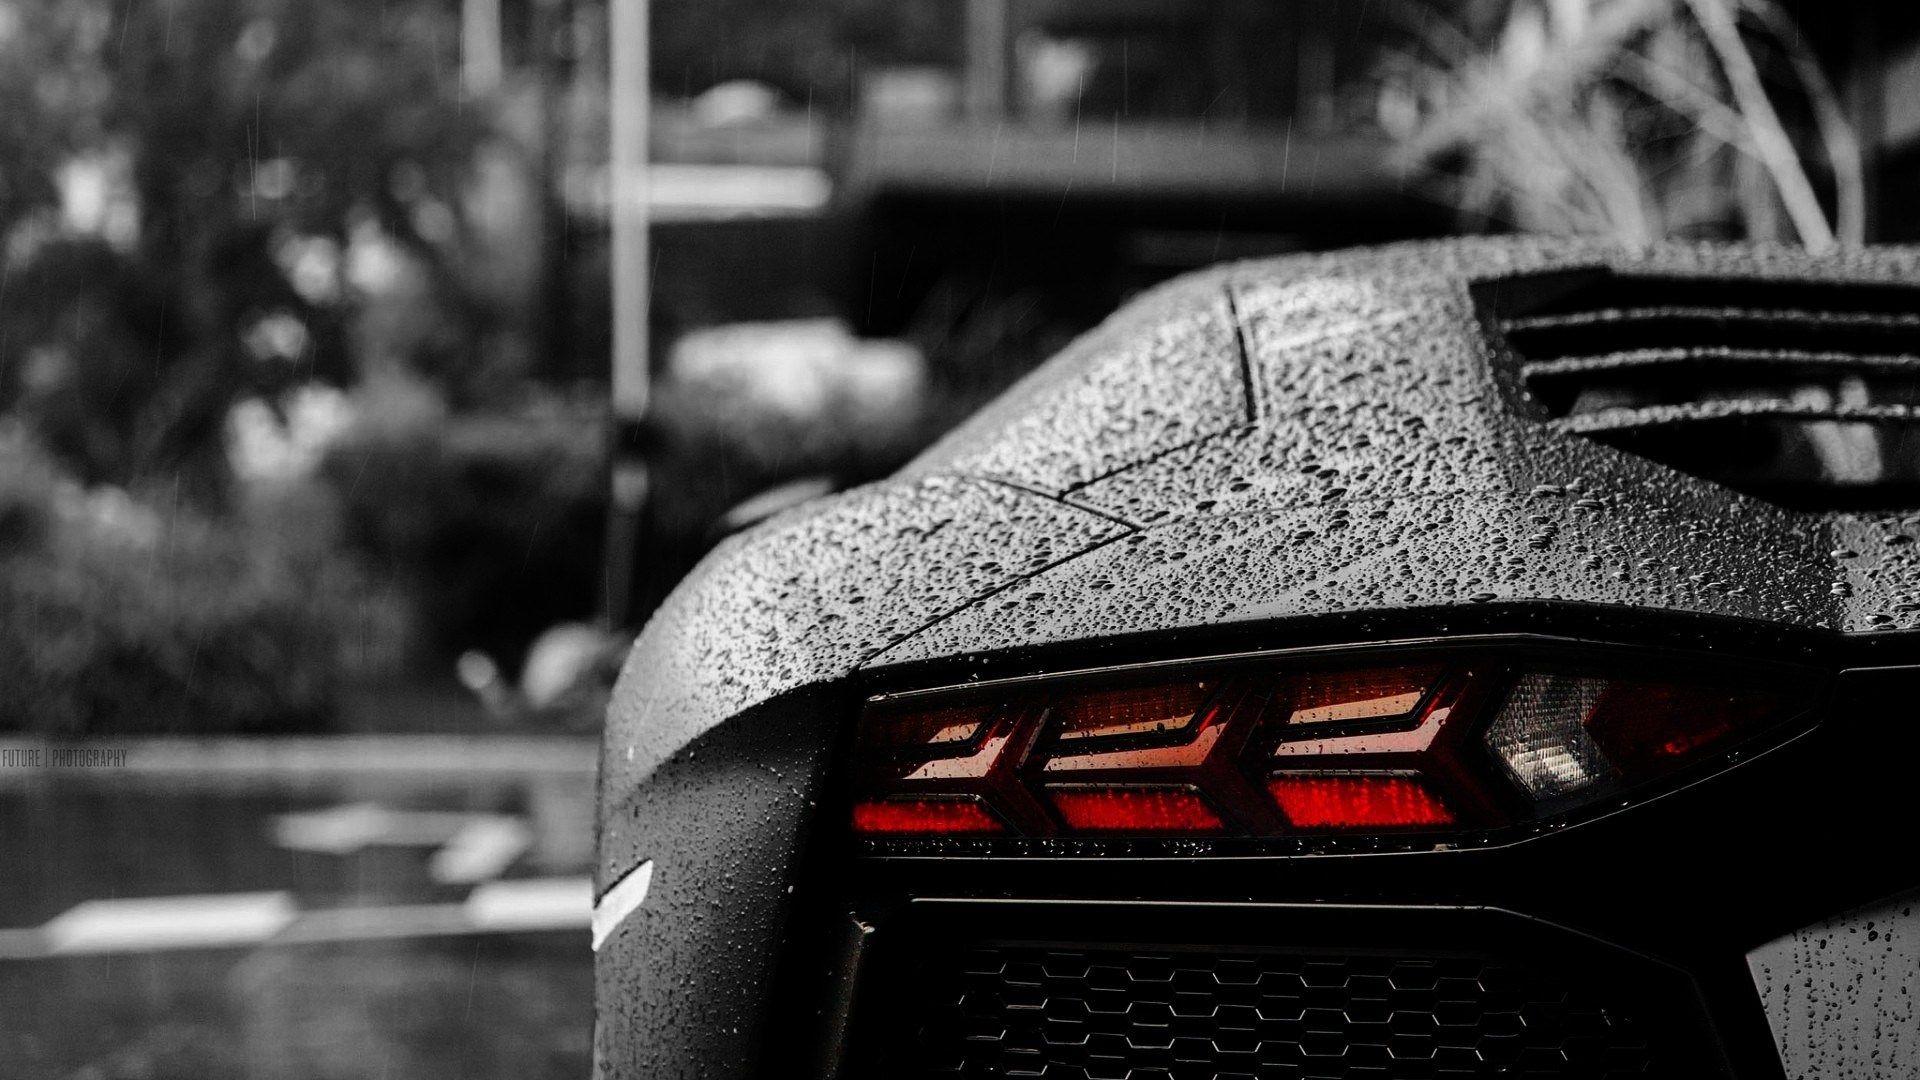 1920x1080 Lamborghini Hd Cool Wallpaper Lamborghini Aventador Wallpaper Lamborghini Car Wallpapers